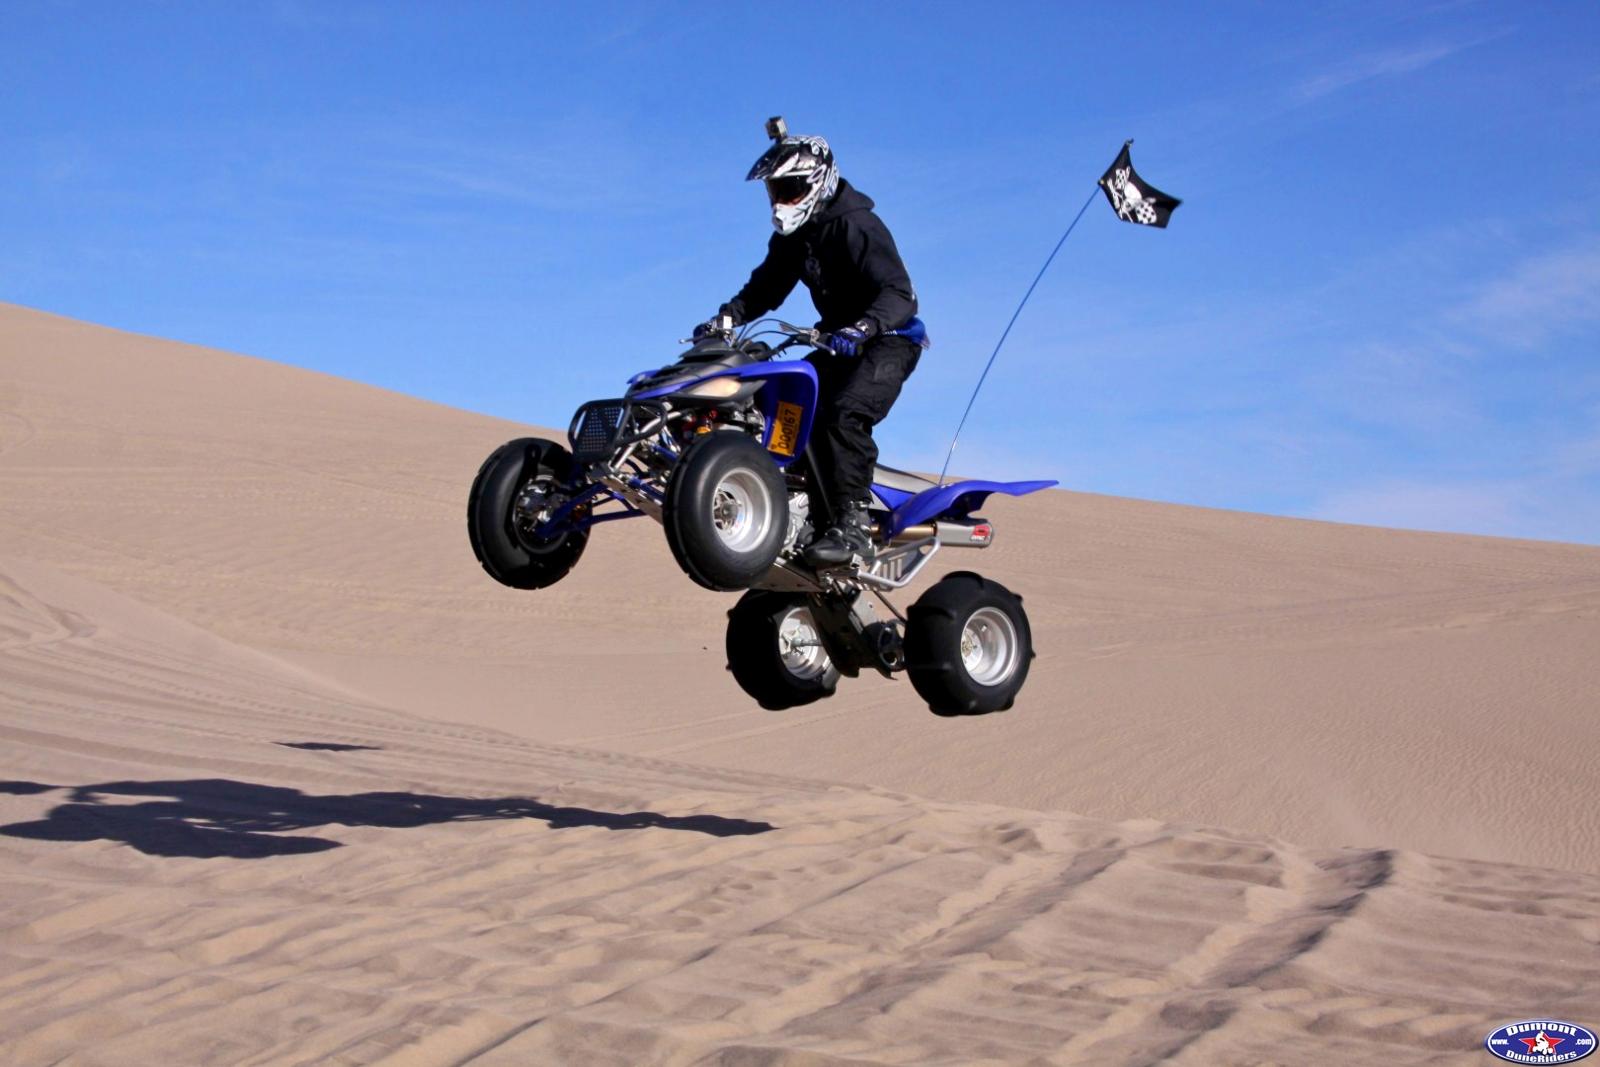 Sunday AM ride, Rap Rider jumping